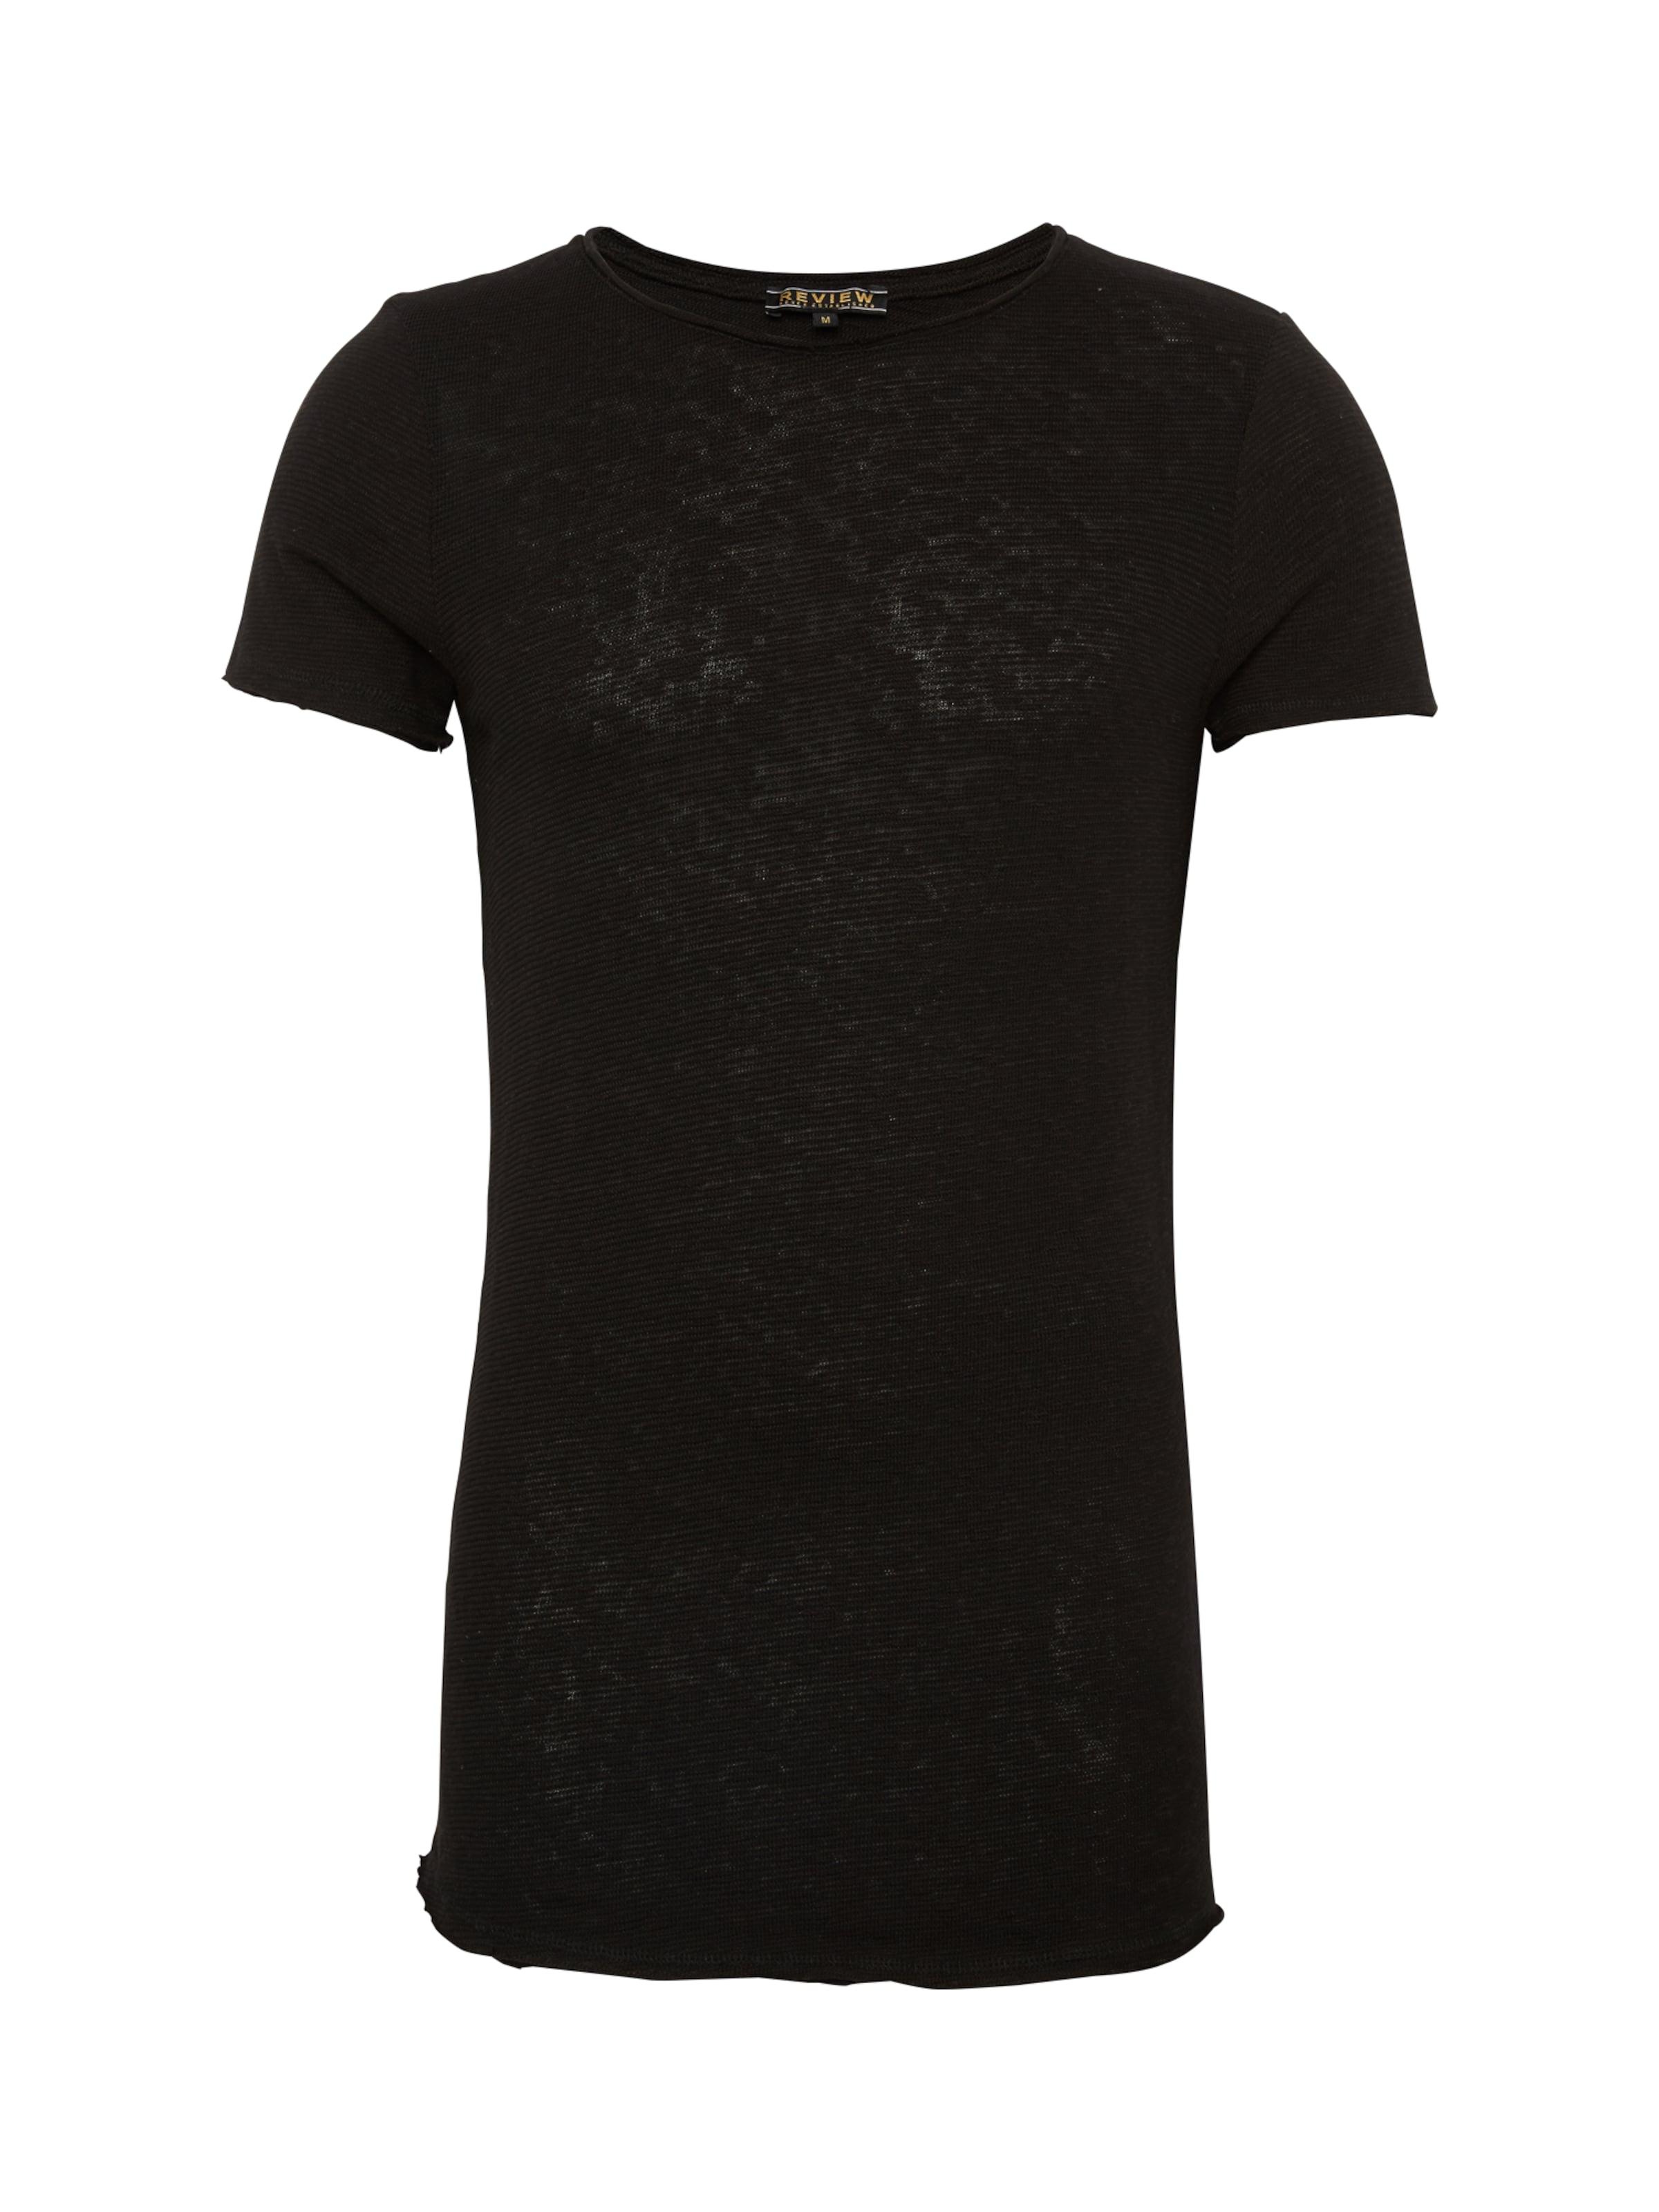 Review Tee' 'yarndyedslub In Schwarz Shirt oexWrdCB